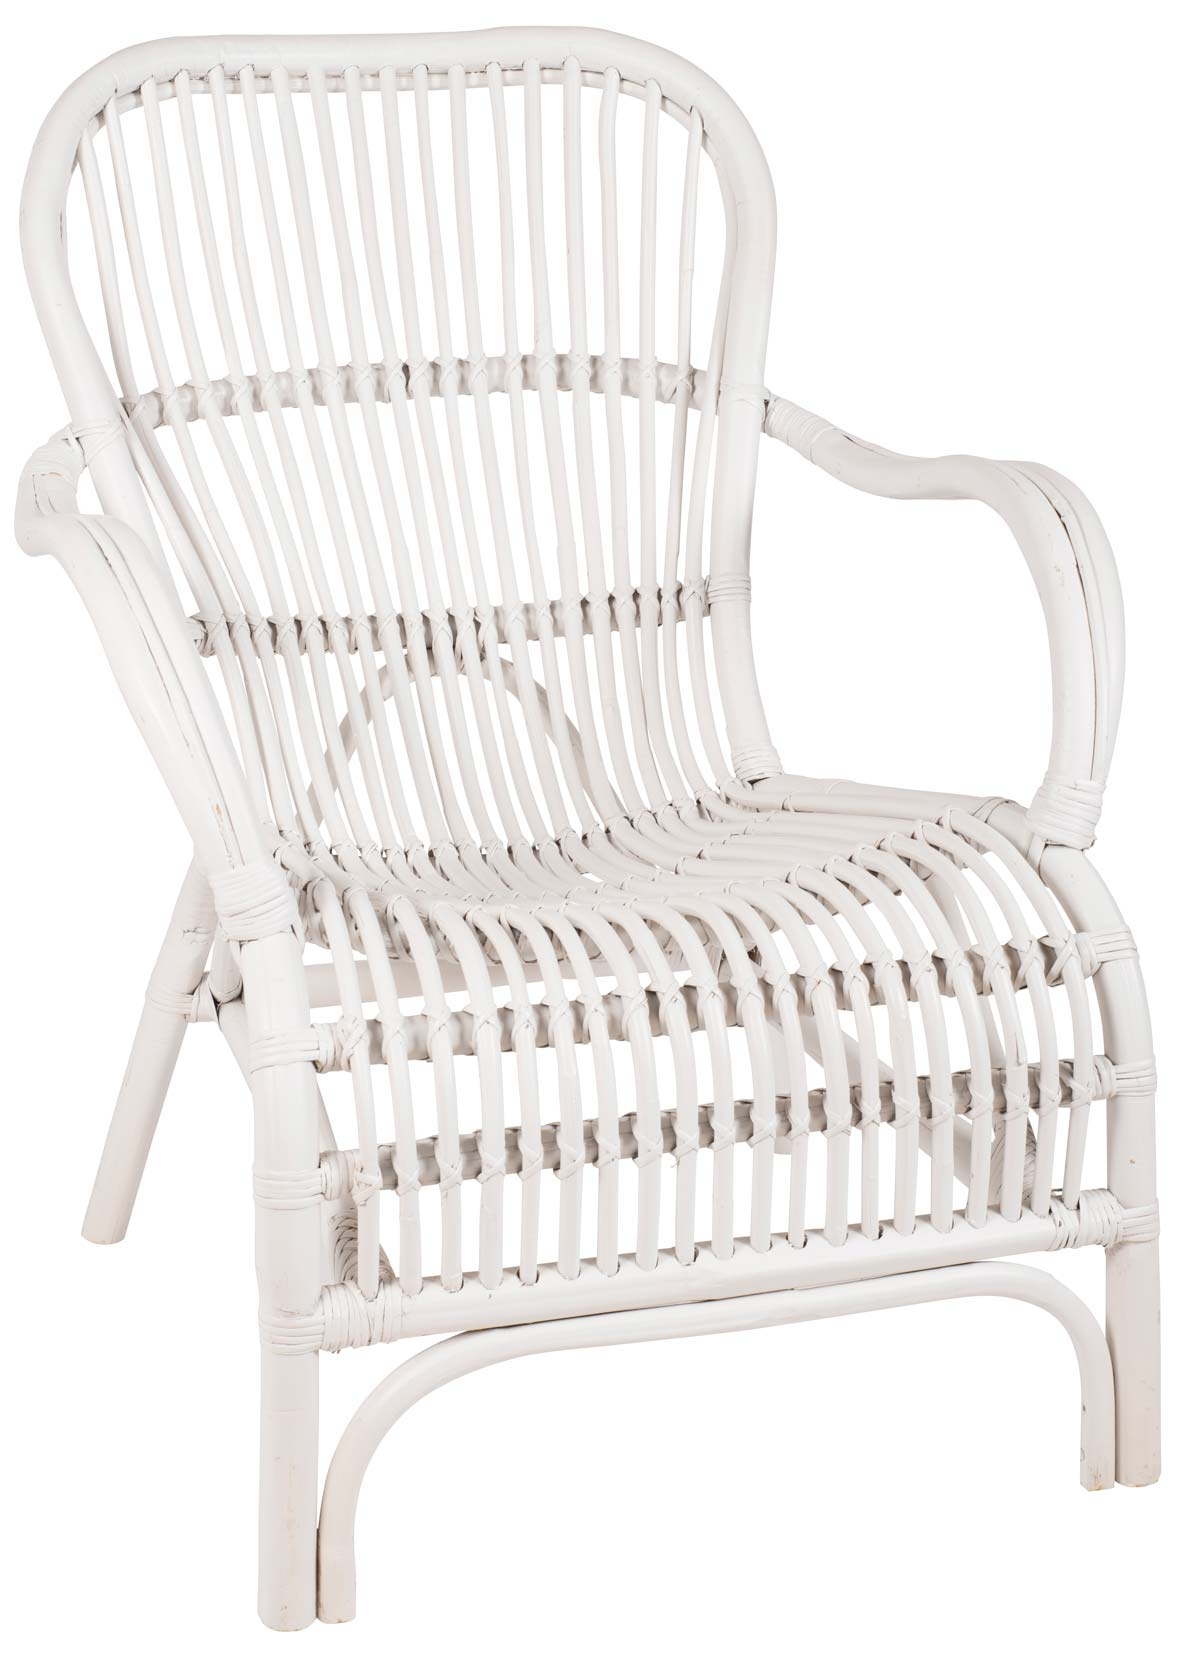 Image of   IB LAURSEN Lænestol rattan hvid